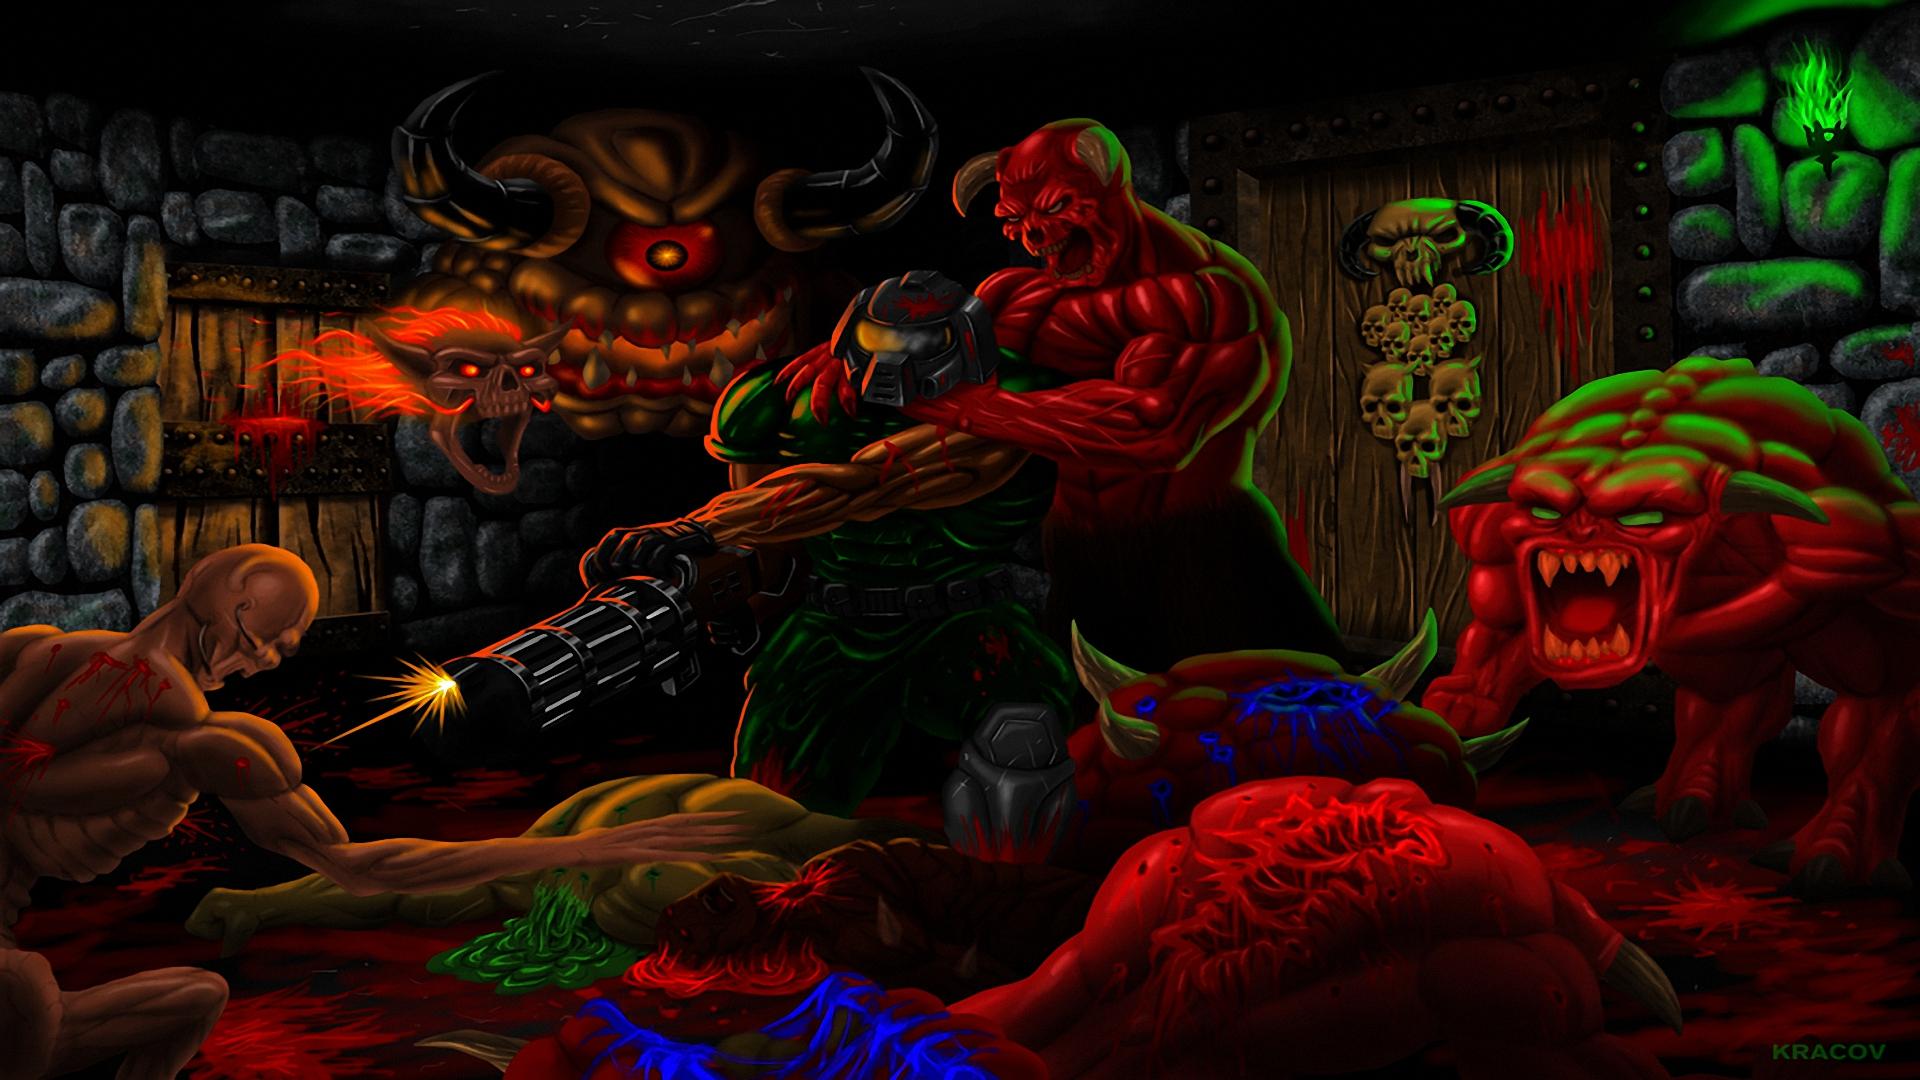 brutal doom hd wallpaper | background image | 1920x1080 | id:686969